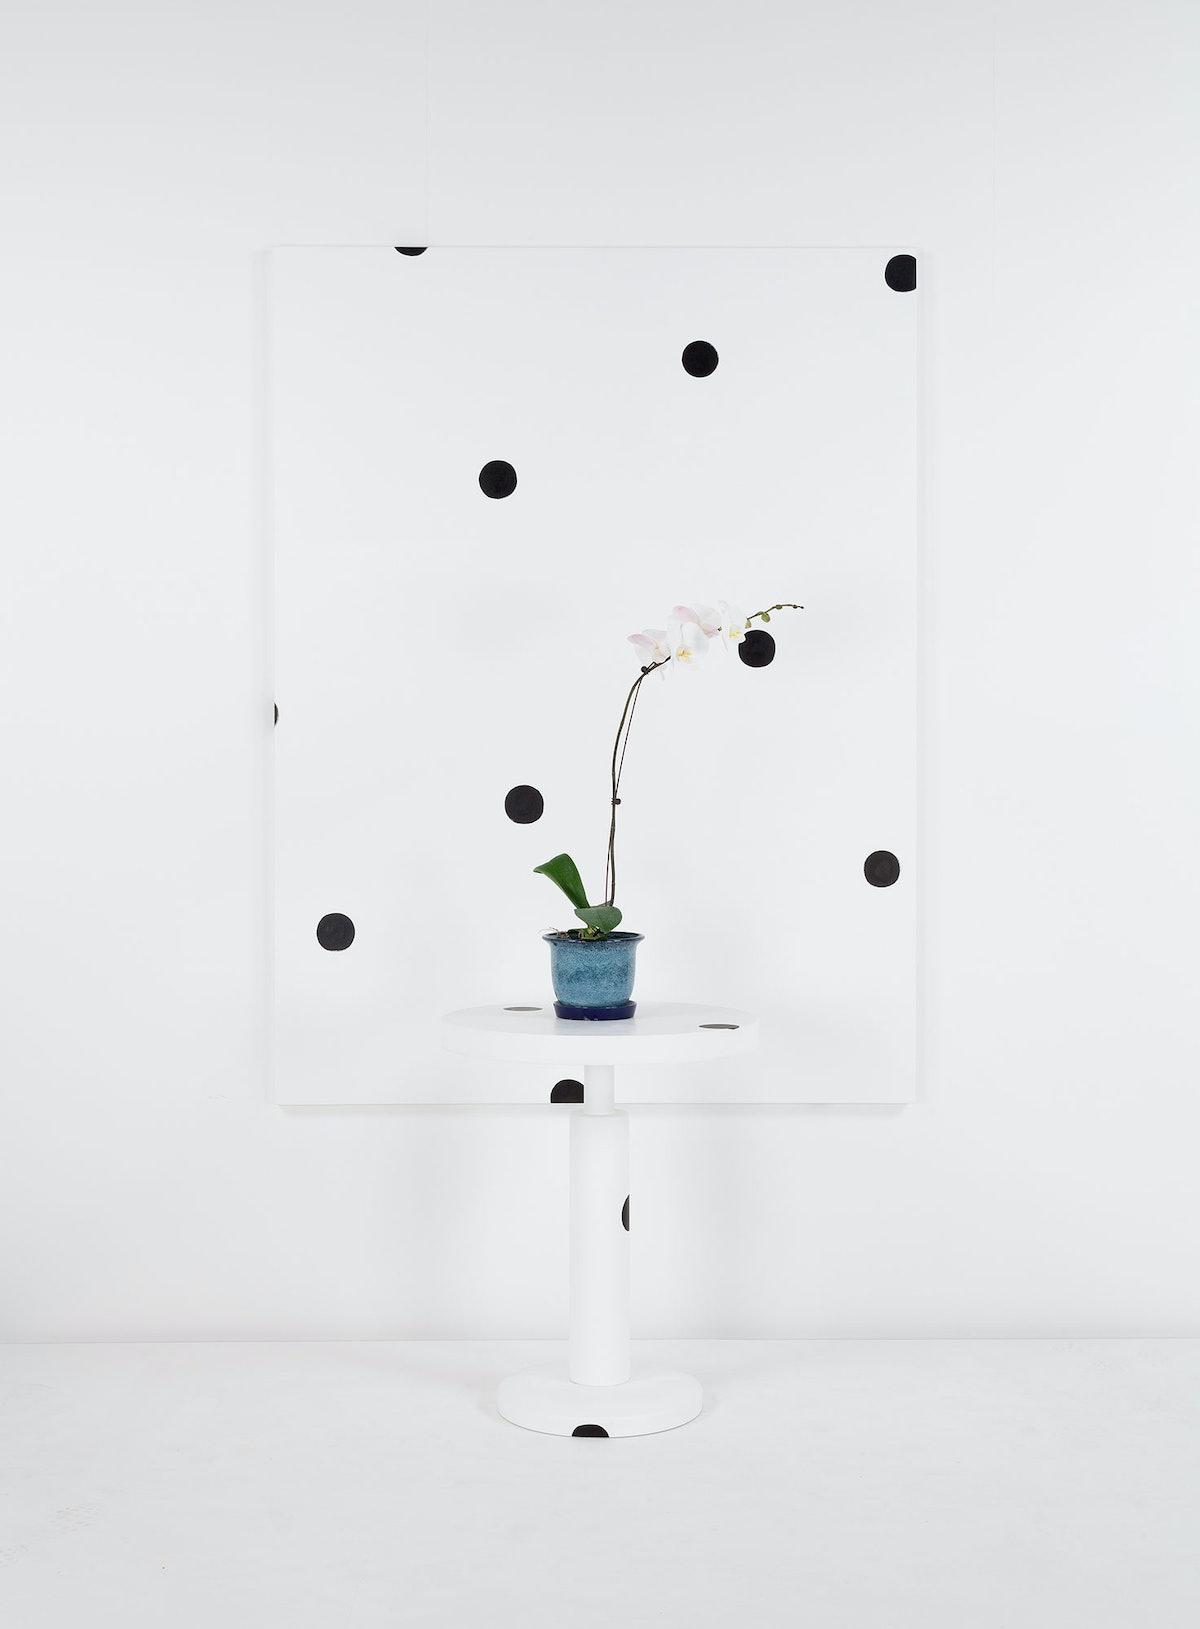 (Shiro Kuramata Kyoto Round Table) + Dot Painting + Orchard, 2014 by Margaret Lee